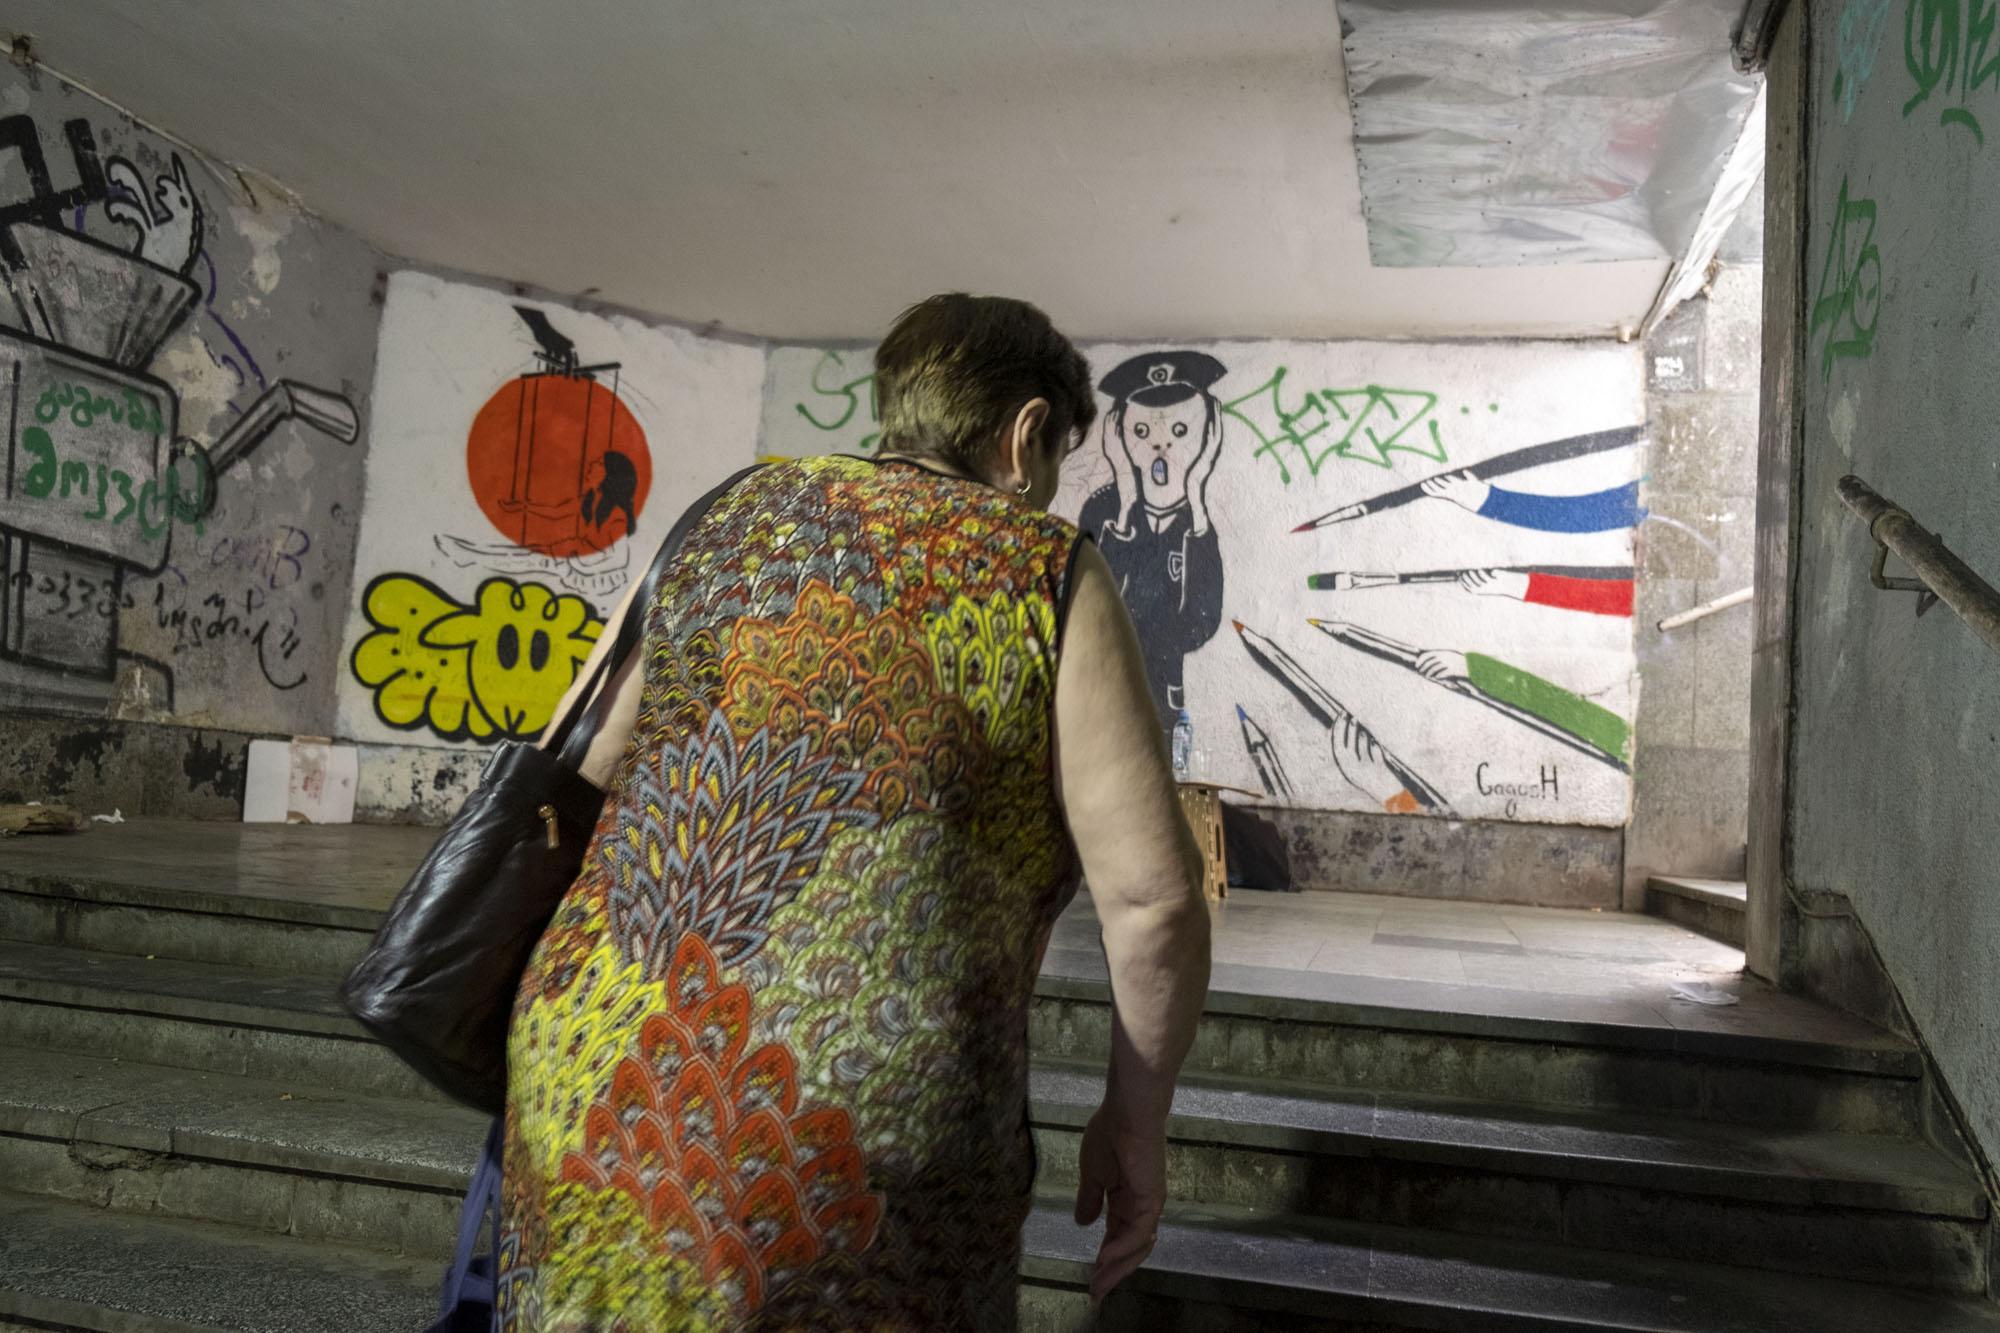 woman walking up stairs with graffiti.jpg